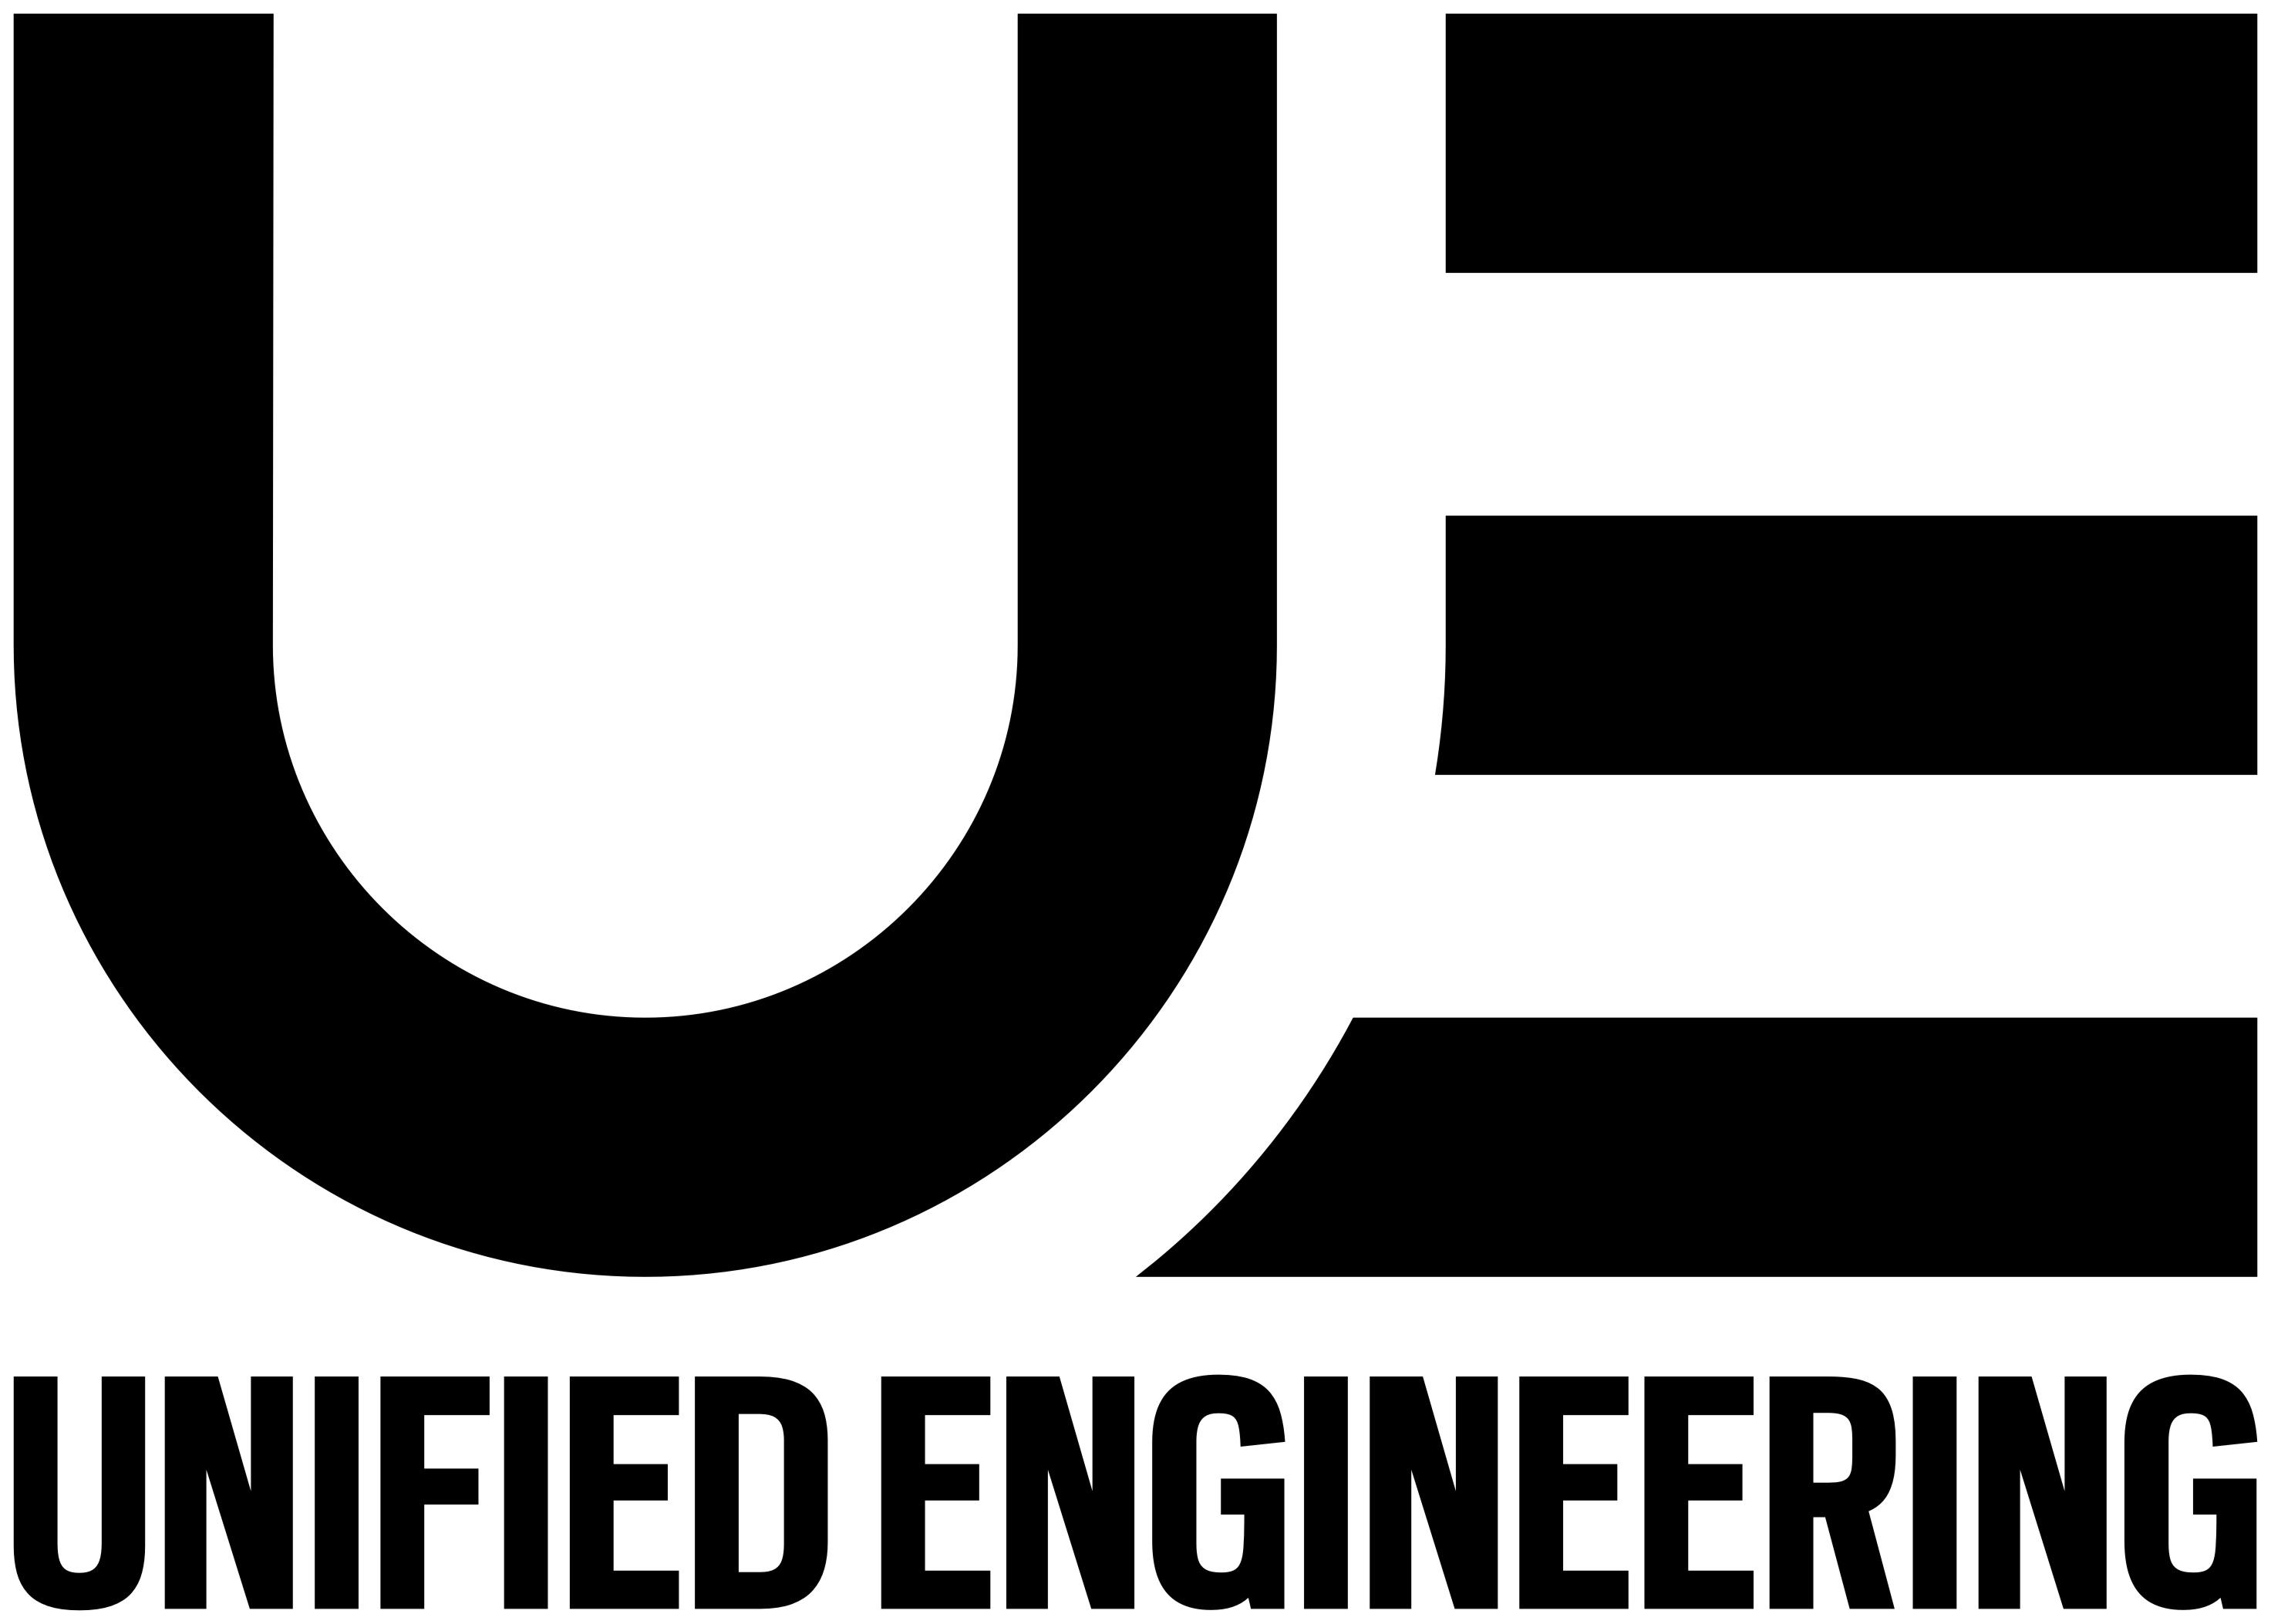 Unified Engineering